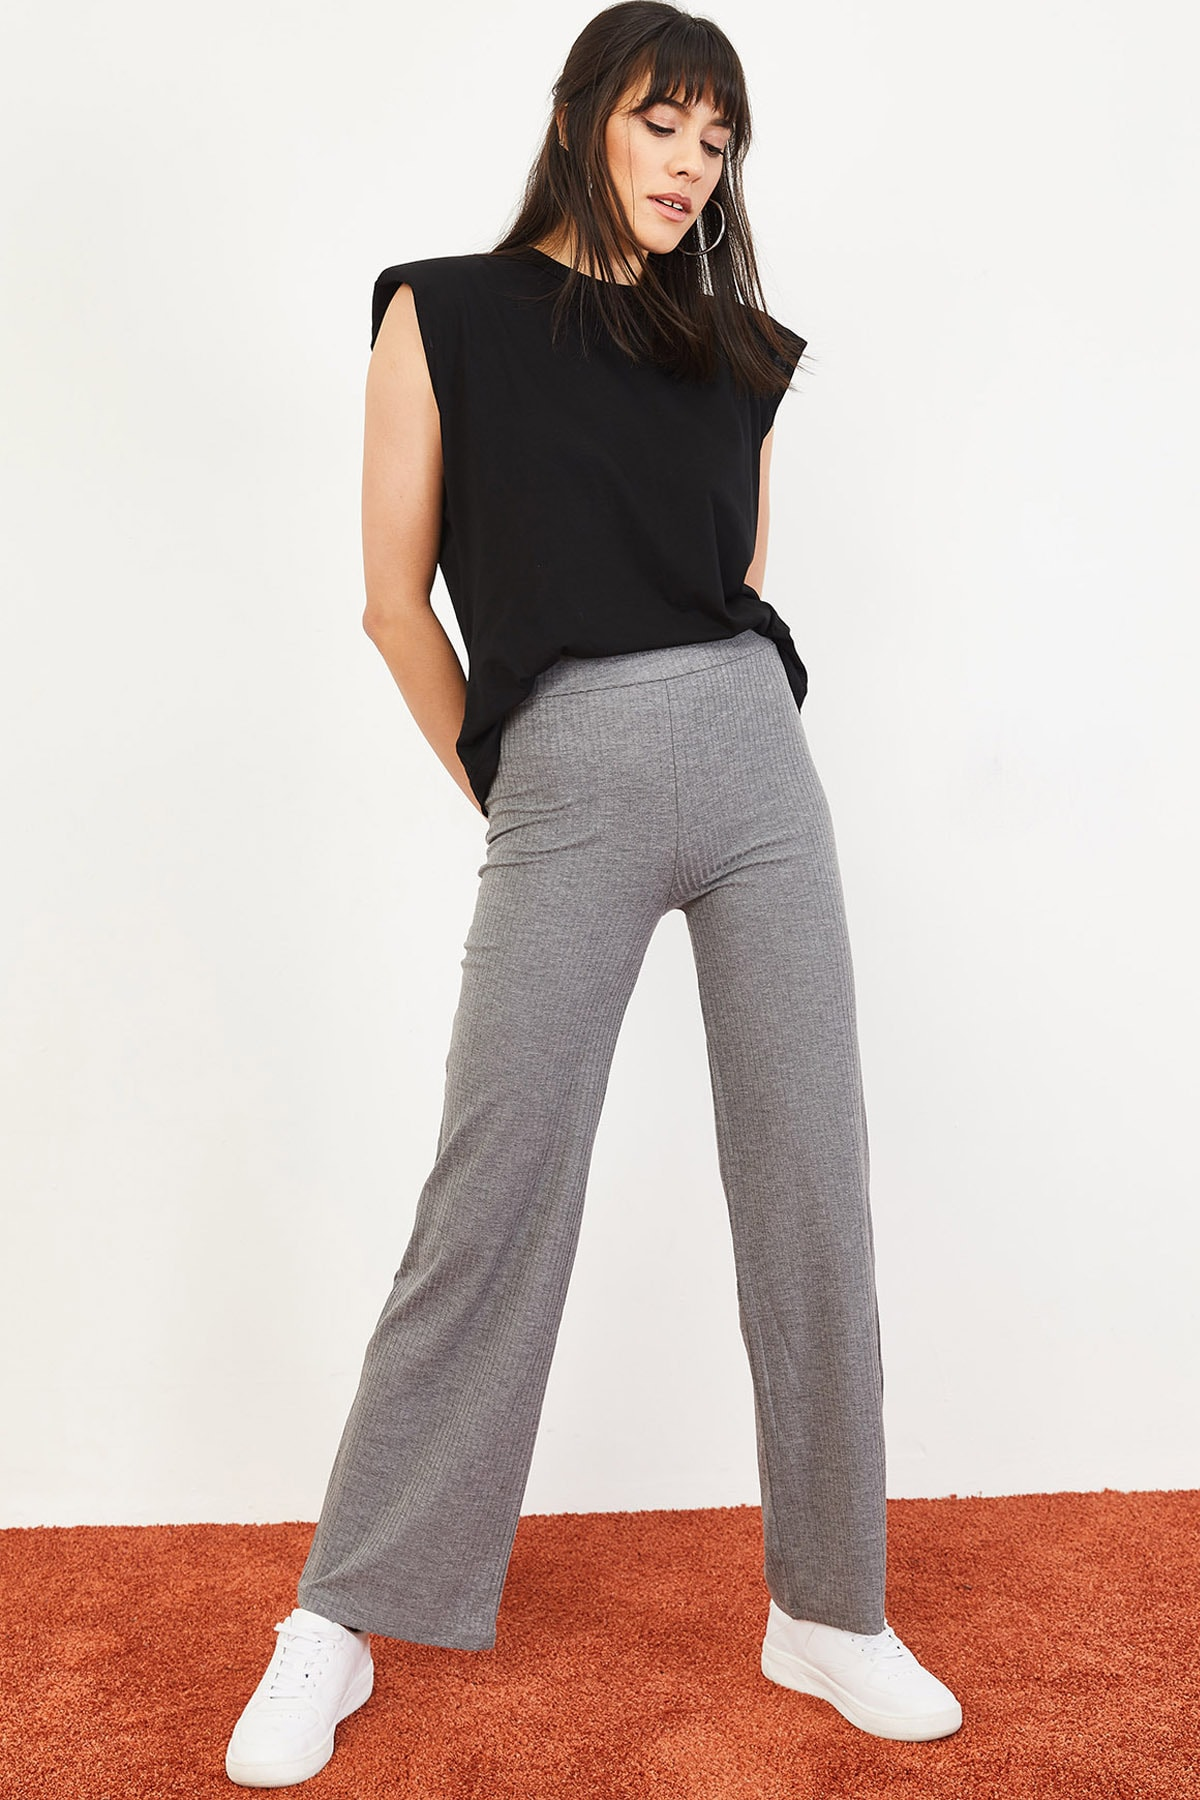 Bianco Lucci Kadın Gri İspanyol Paça Beli Lastikli Rahat Pantolon 10051020 3